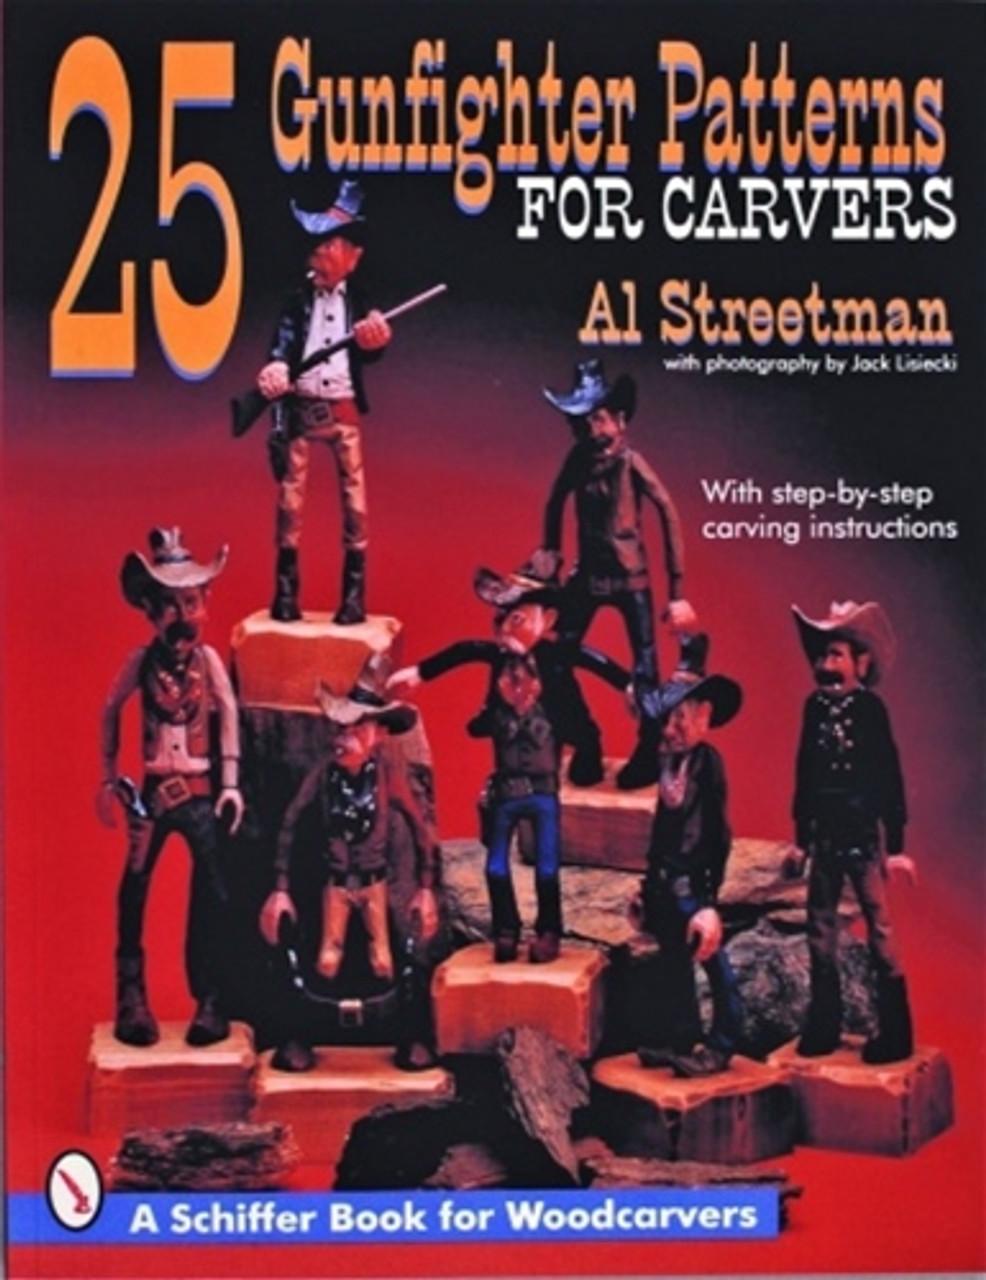 25 Gunfighter Patterns for Carvers